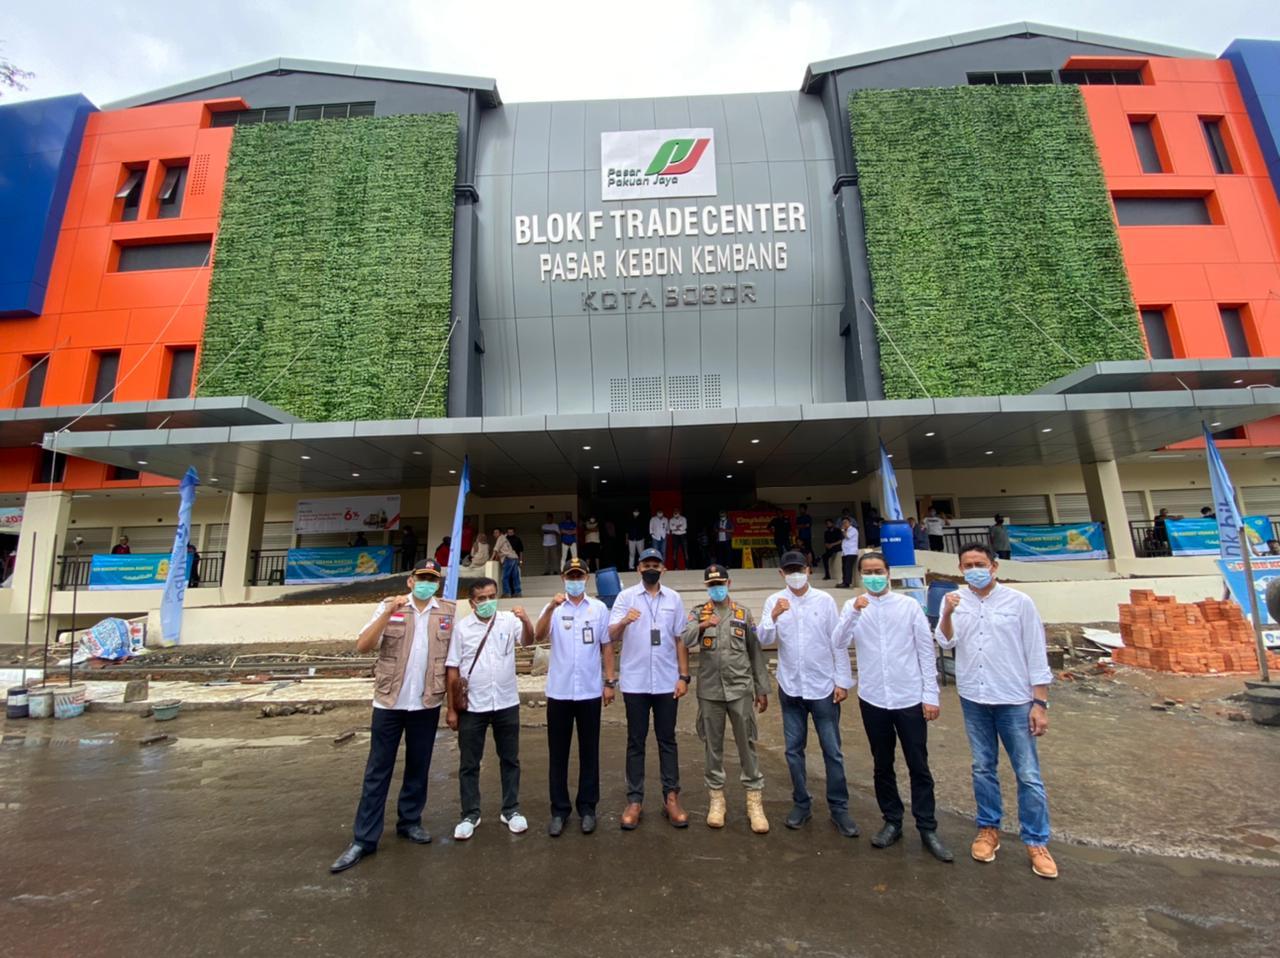 TPS Sudah Dibongkar, Blok F Pasar Kebon Kembang Siap Beroperasi